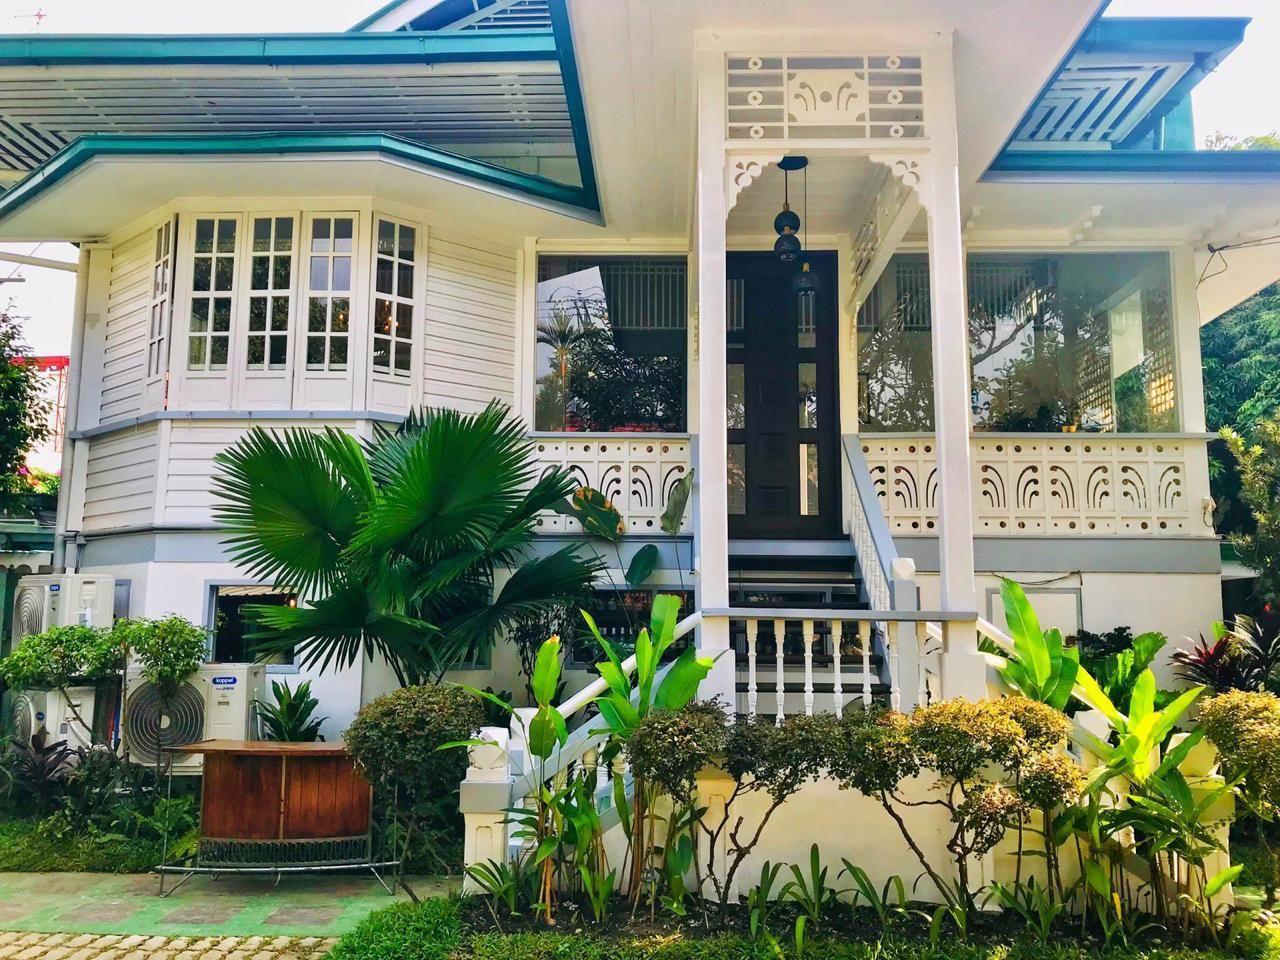 Tola, Kan-anan sa Balay Oboza in Davao: Ancestral Home, Heritage Cuisine